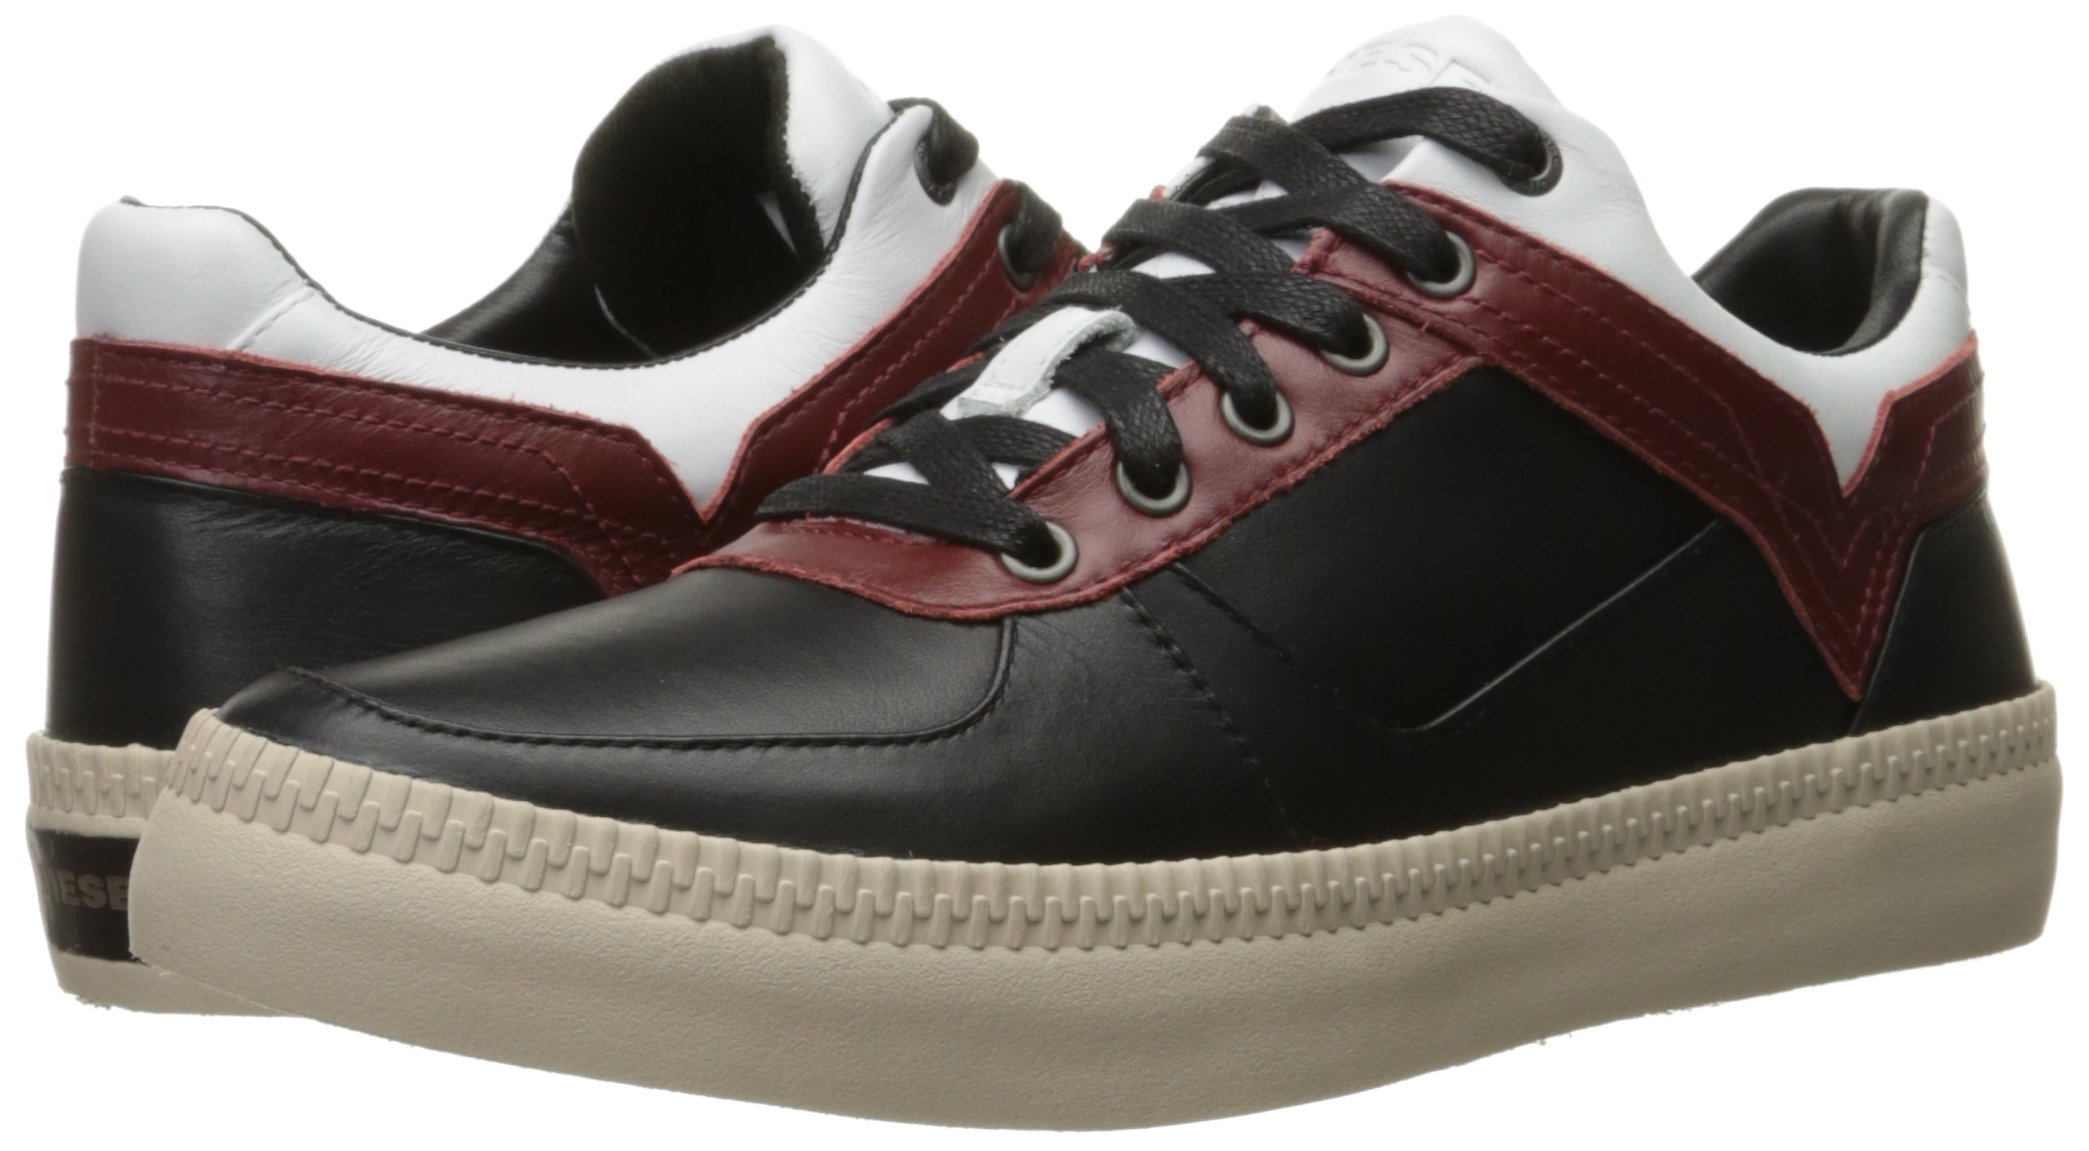 Diesel Men's V S-Spaark Low Fashion Sneaker, Black/White/Biking Red, 10.5 M US by Diesel (Image #6)